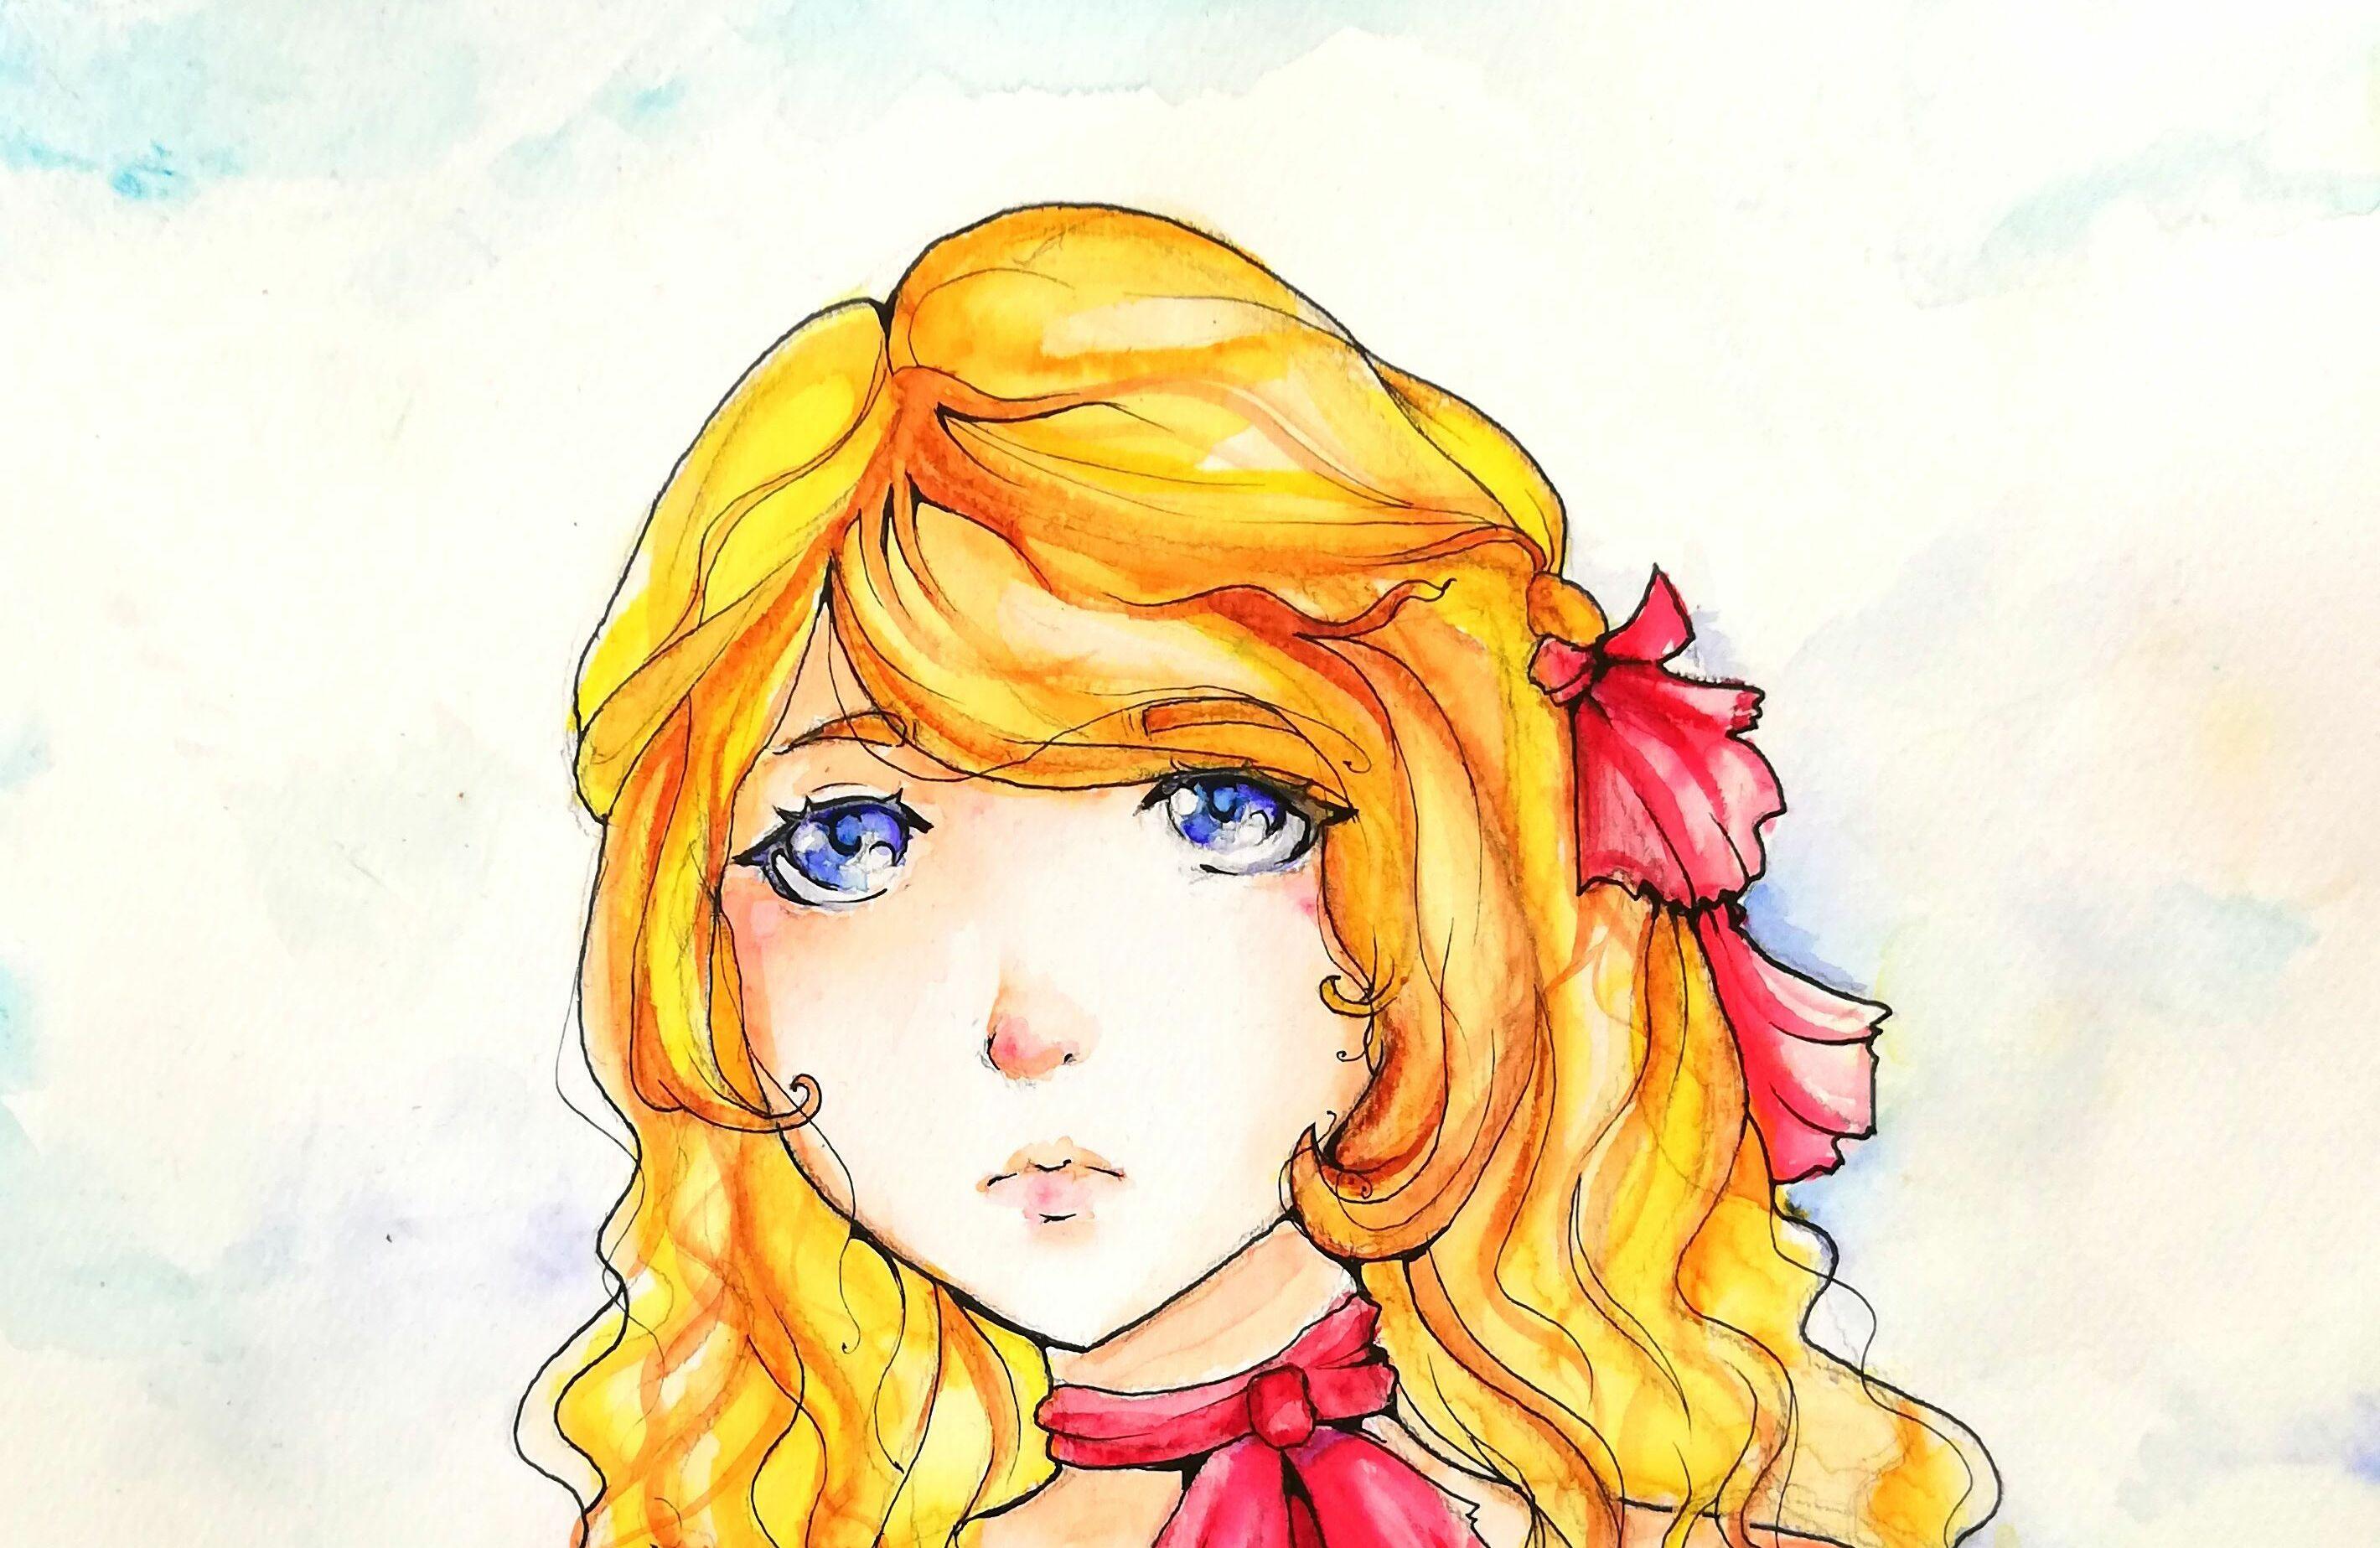 Stacjonarny plener Manga od 8 lat